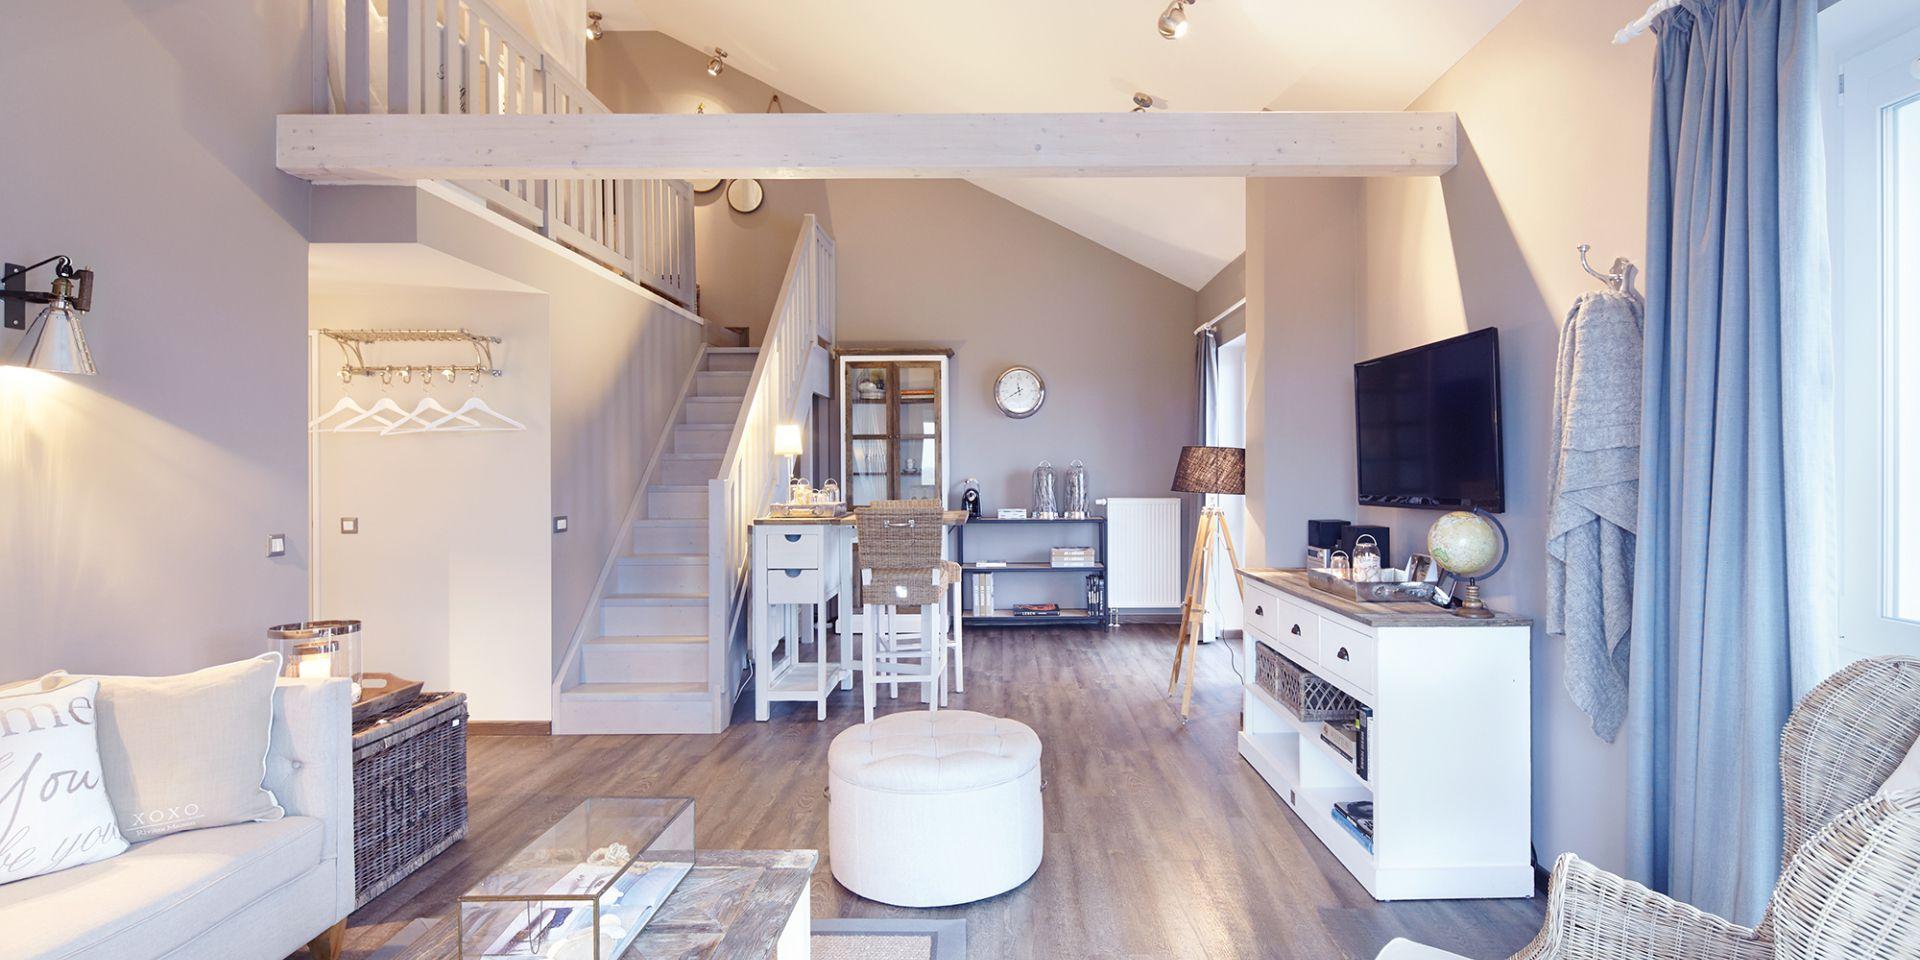 rivi ra maison suite beach motel st peter ording. Black Bedroom Furniture Sets. Home Design Ideas